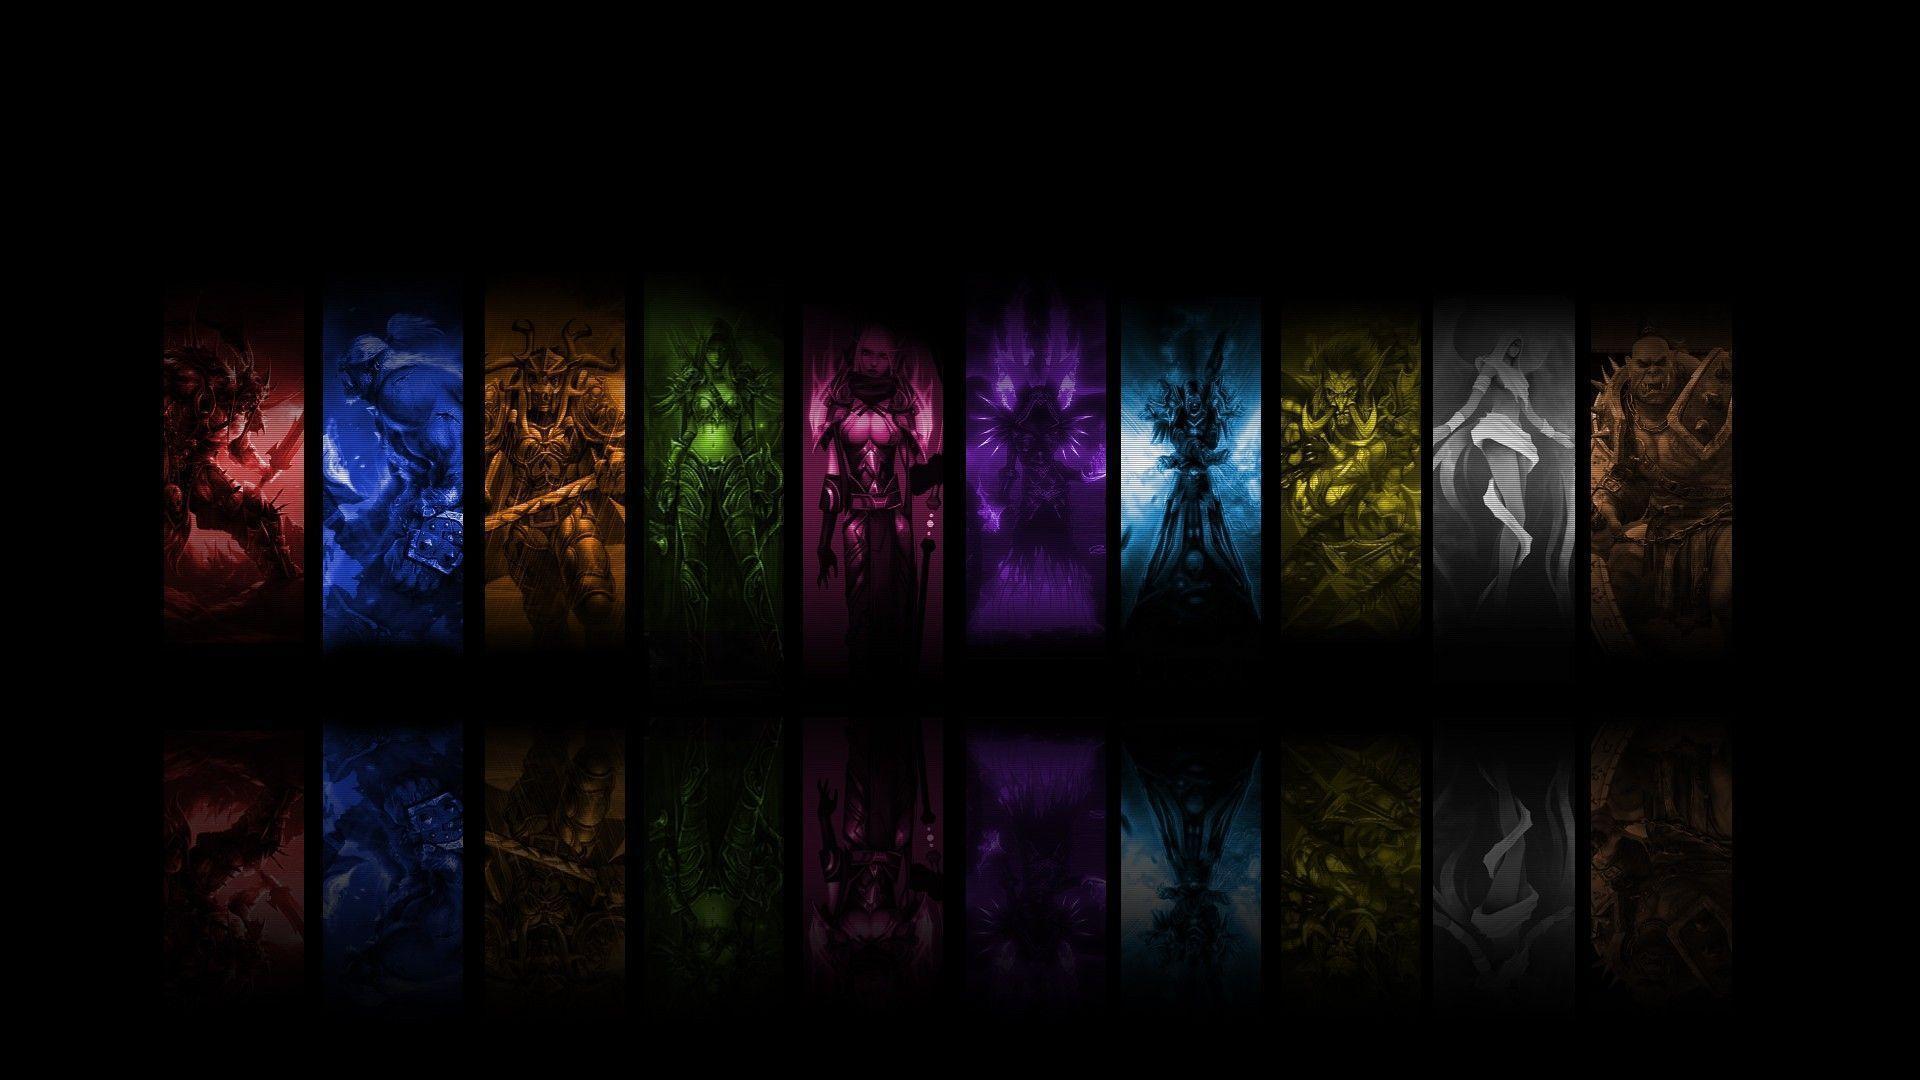 WoW Desktop Backgrounds - Wallpaper Cave